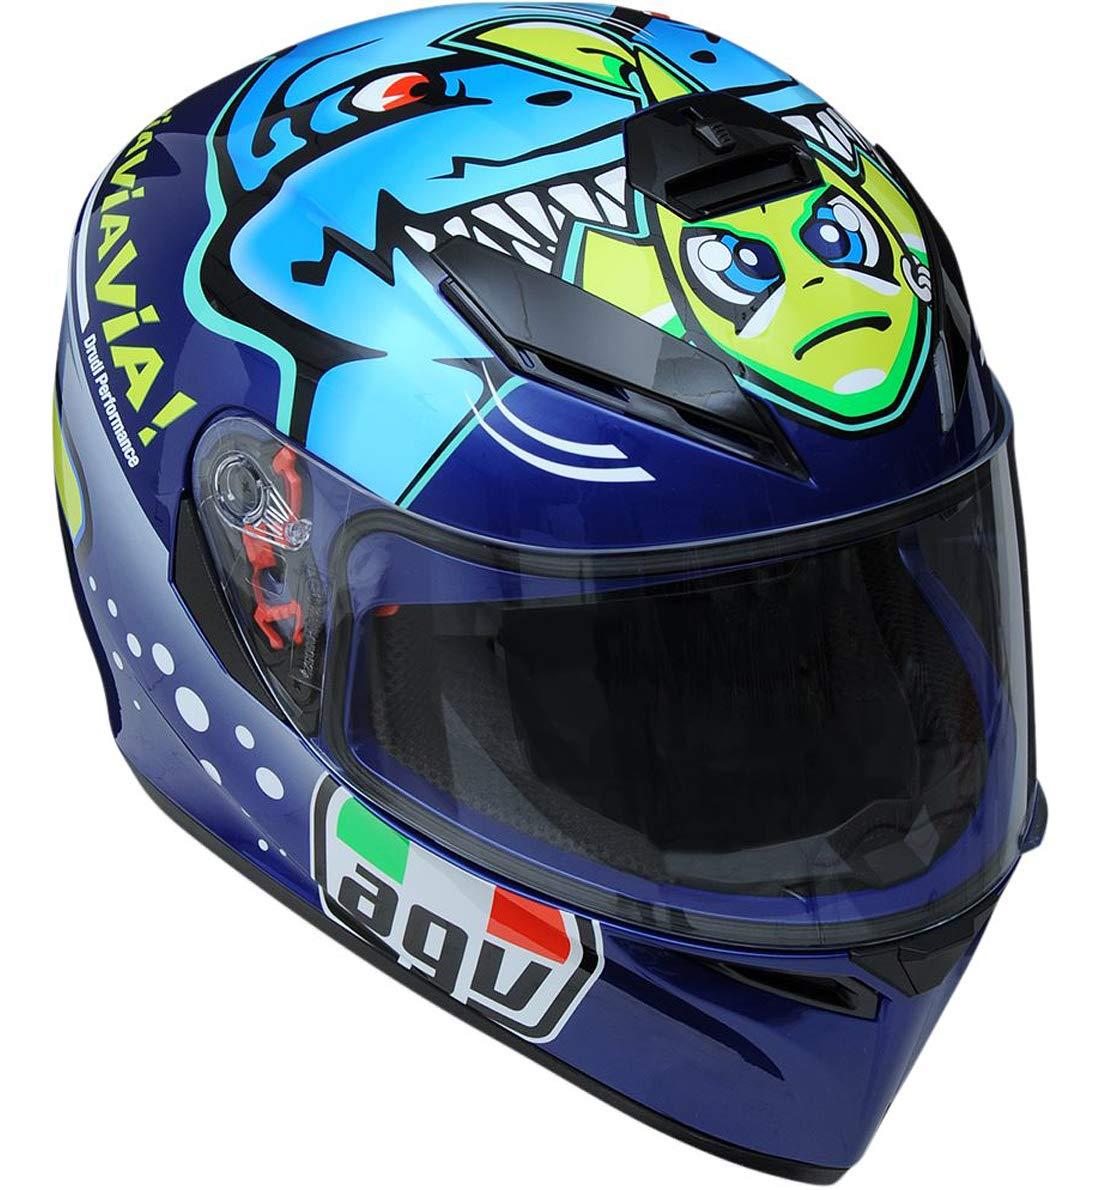 Agv K3 Sv Helmet Misano 2015 Large Blue Buy Online In Dominica At Dominica Desertcart Com Productid 168571138